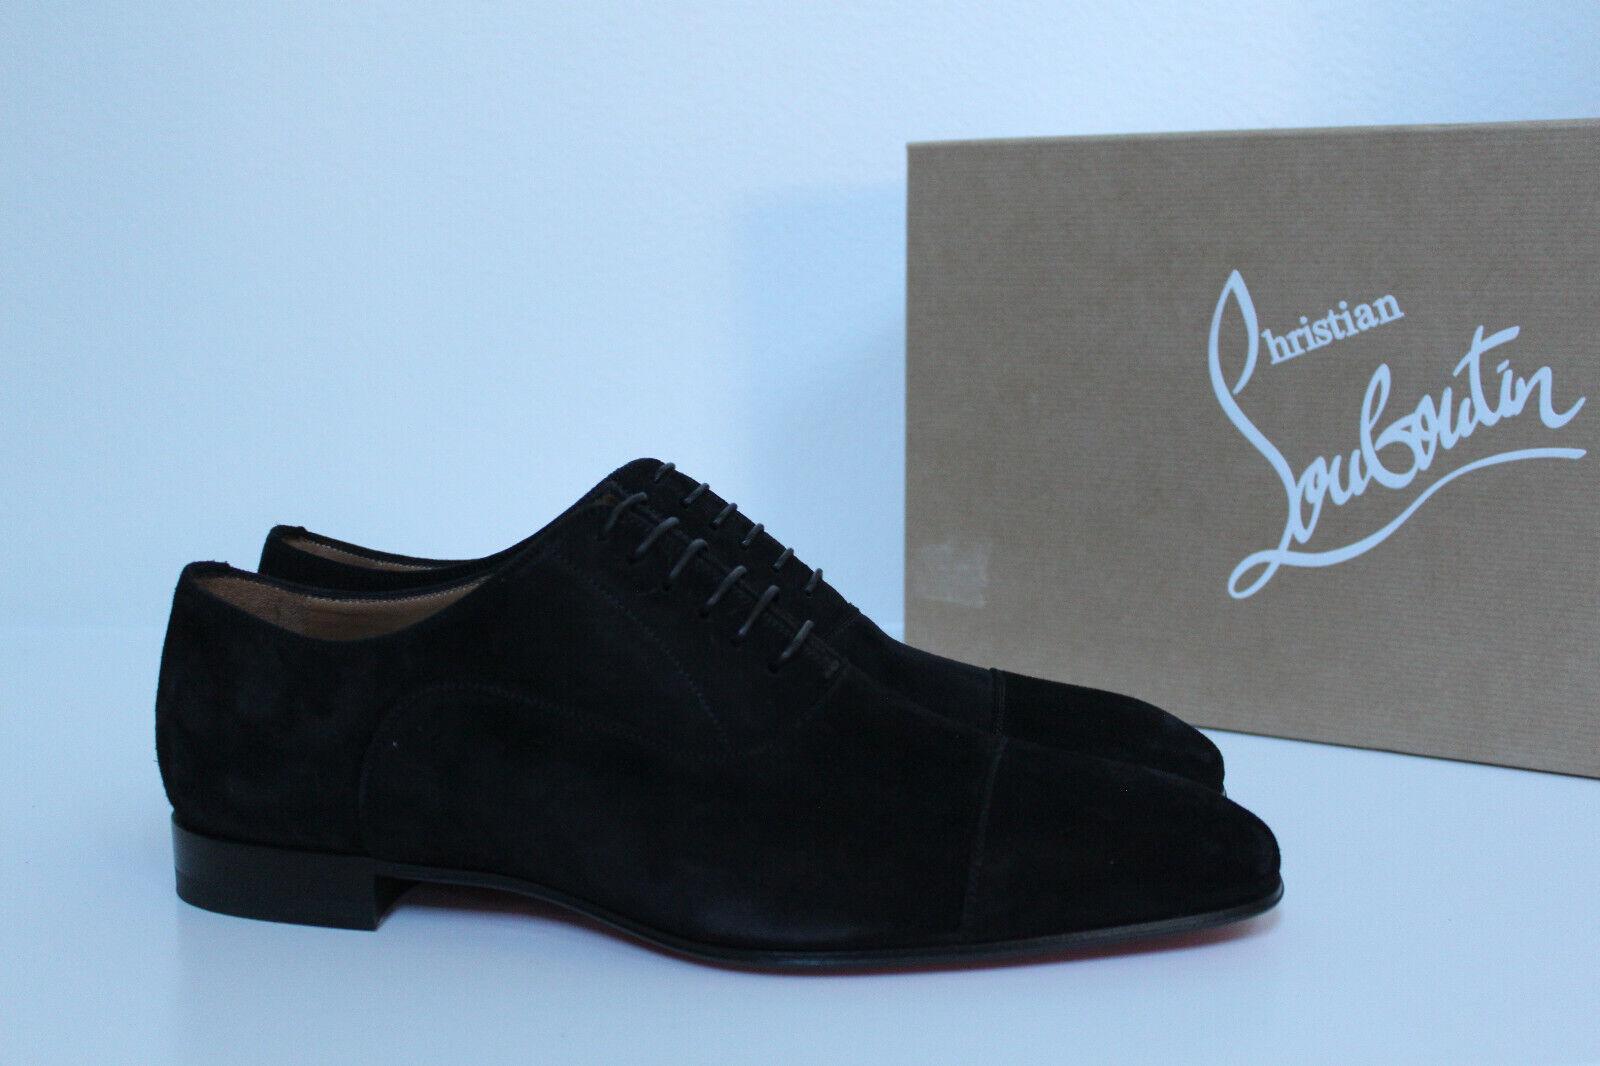 Sz 7 US   40 Christian Louboutin Greggo Flat nero Suede Leather Oxford scarpe